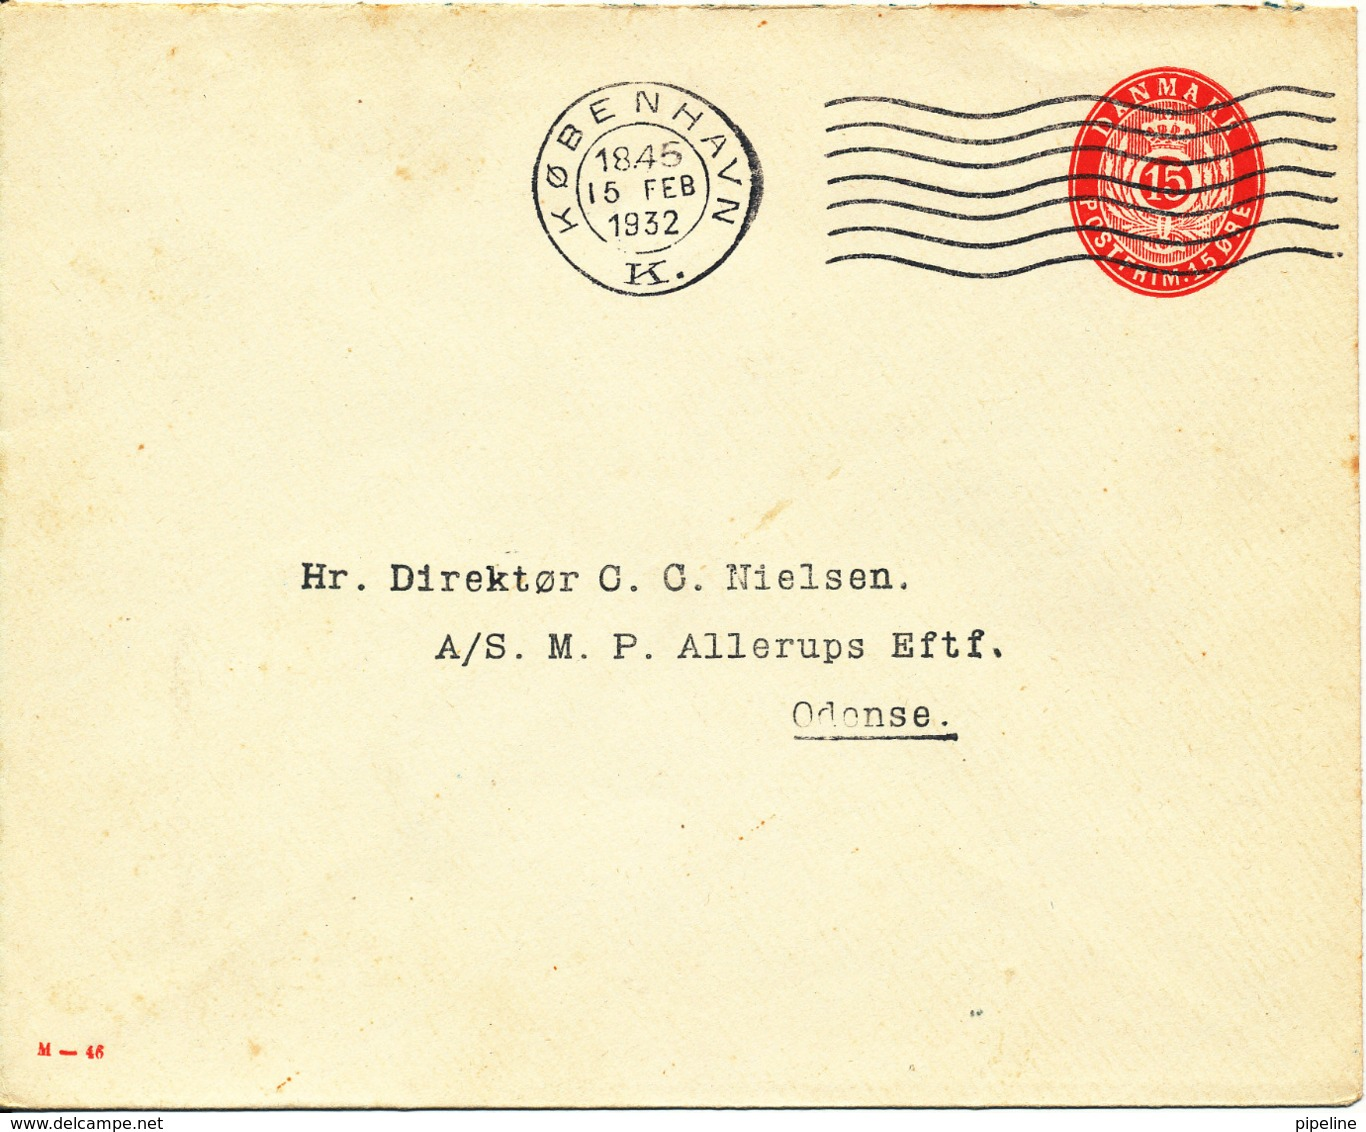 Denmark Postal Stationery Cover 15 öre M - 46 Copenhagen 15-2-1932 (Nice Cover) - Entiers Postaux